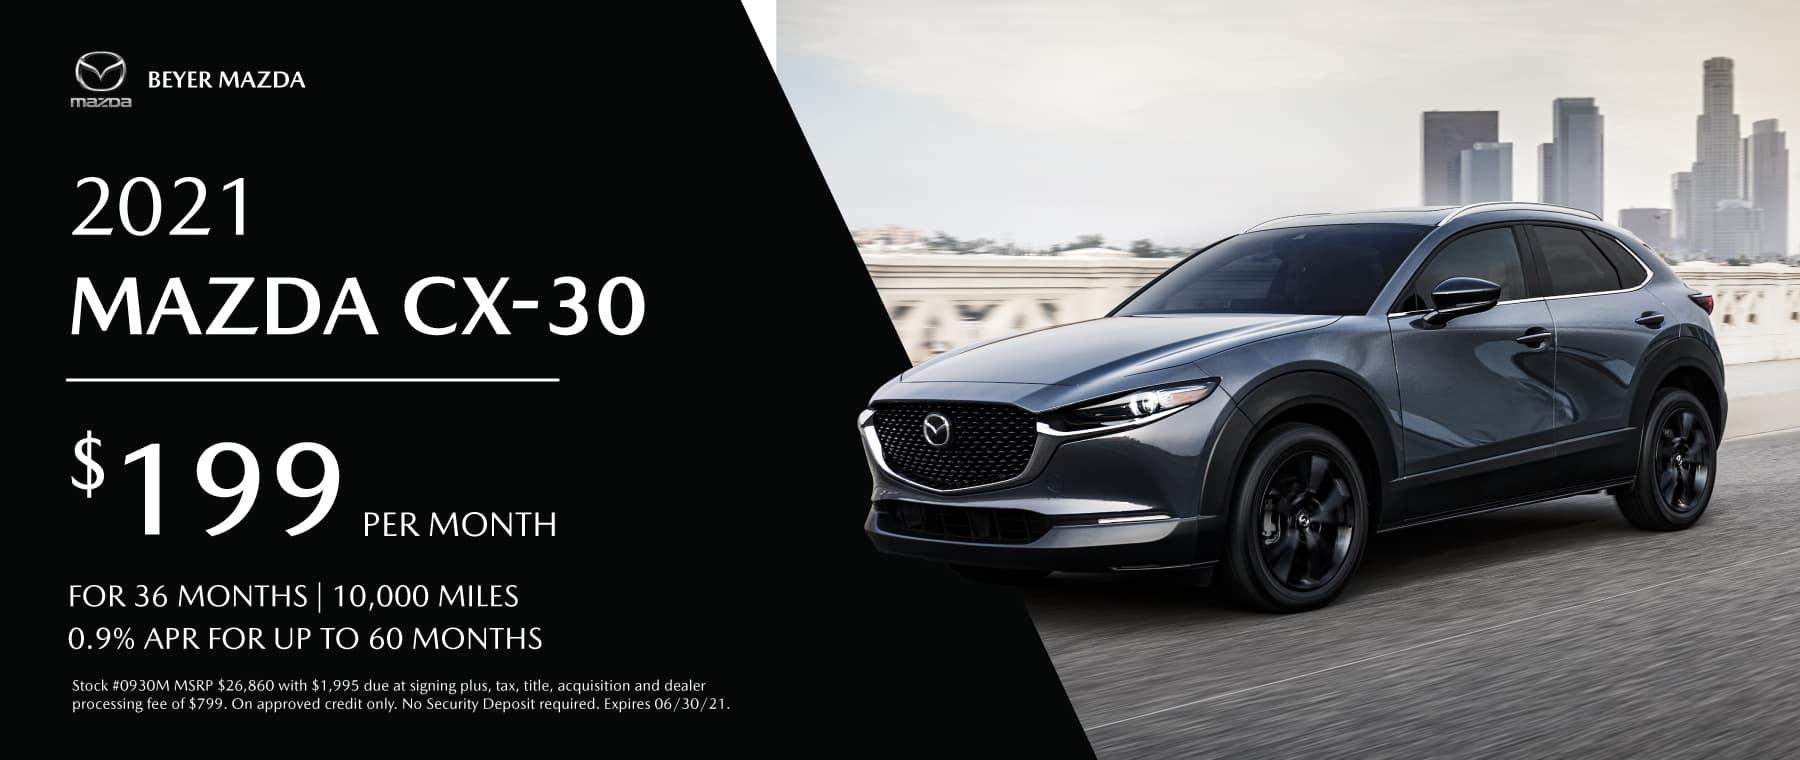 Beyer-Mazda_June2021_CX-30_1800x760